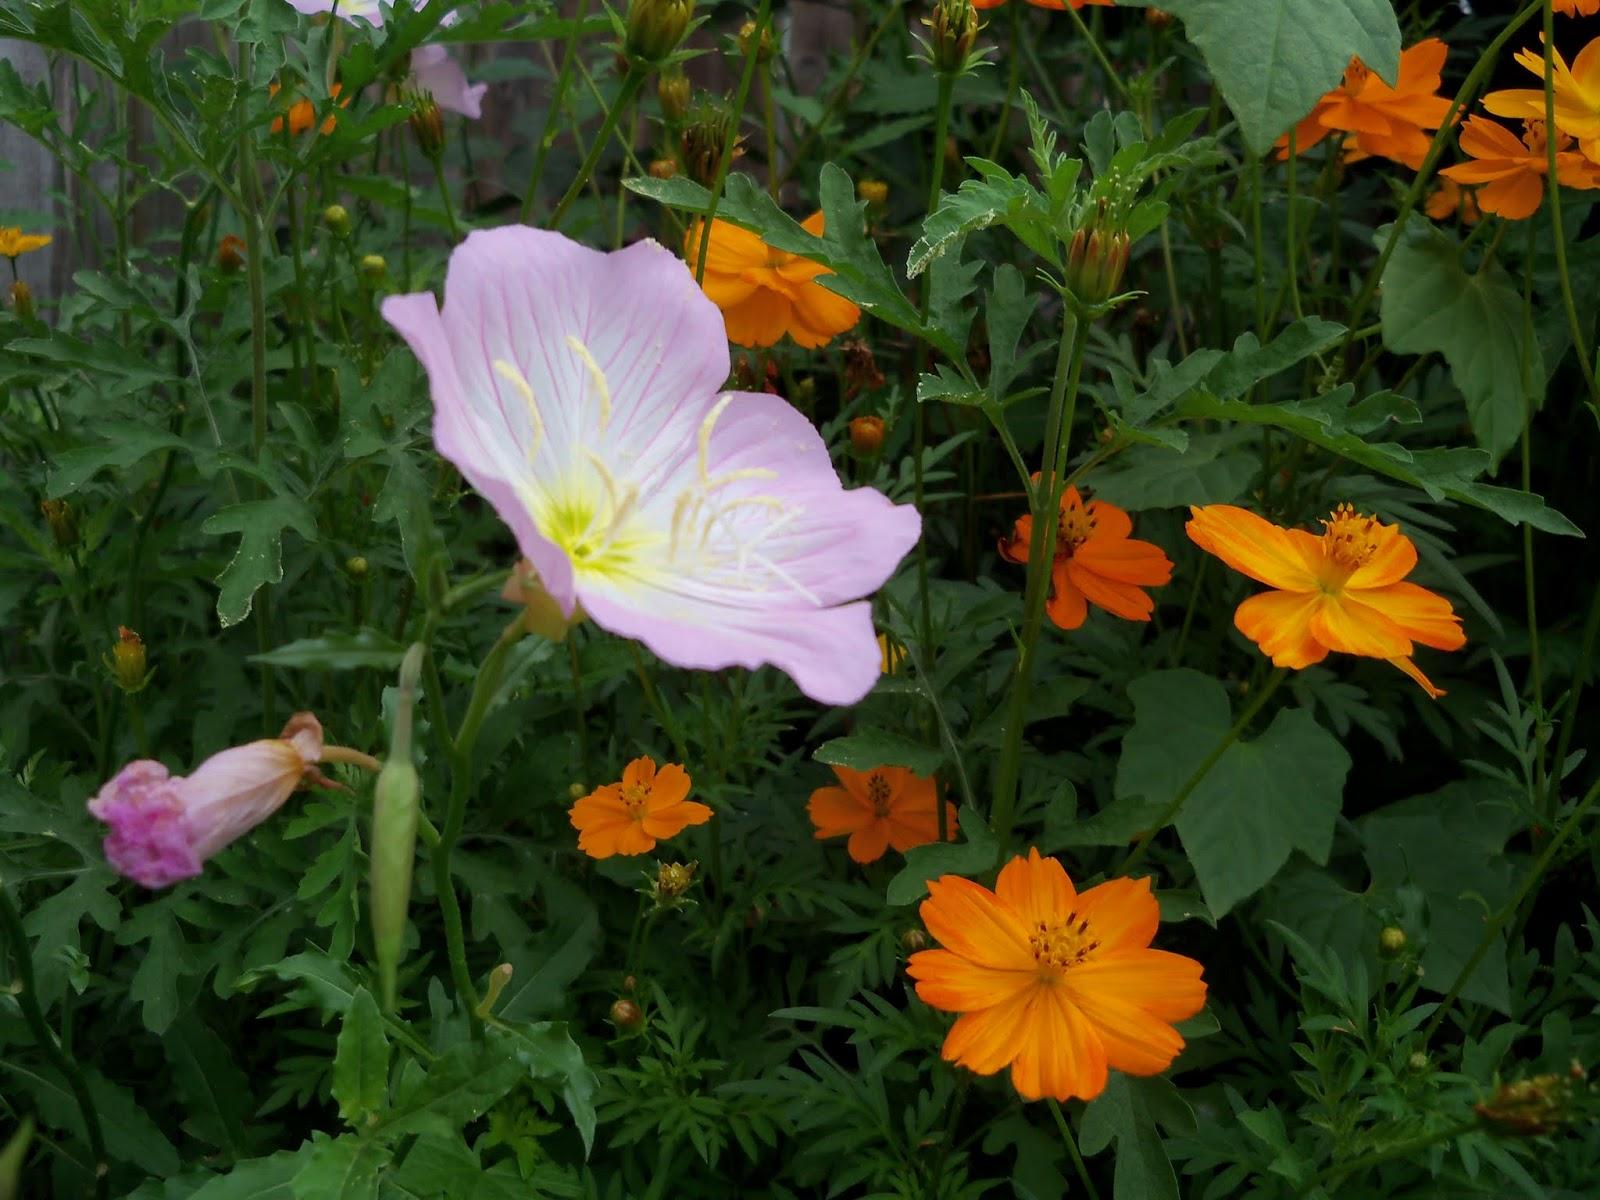 Gardening 2013 - 115_5983.JPG